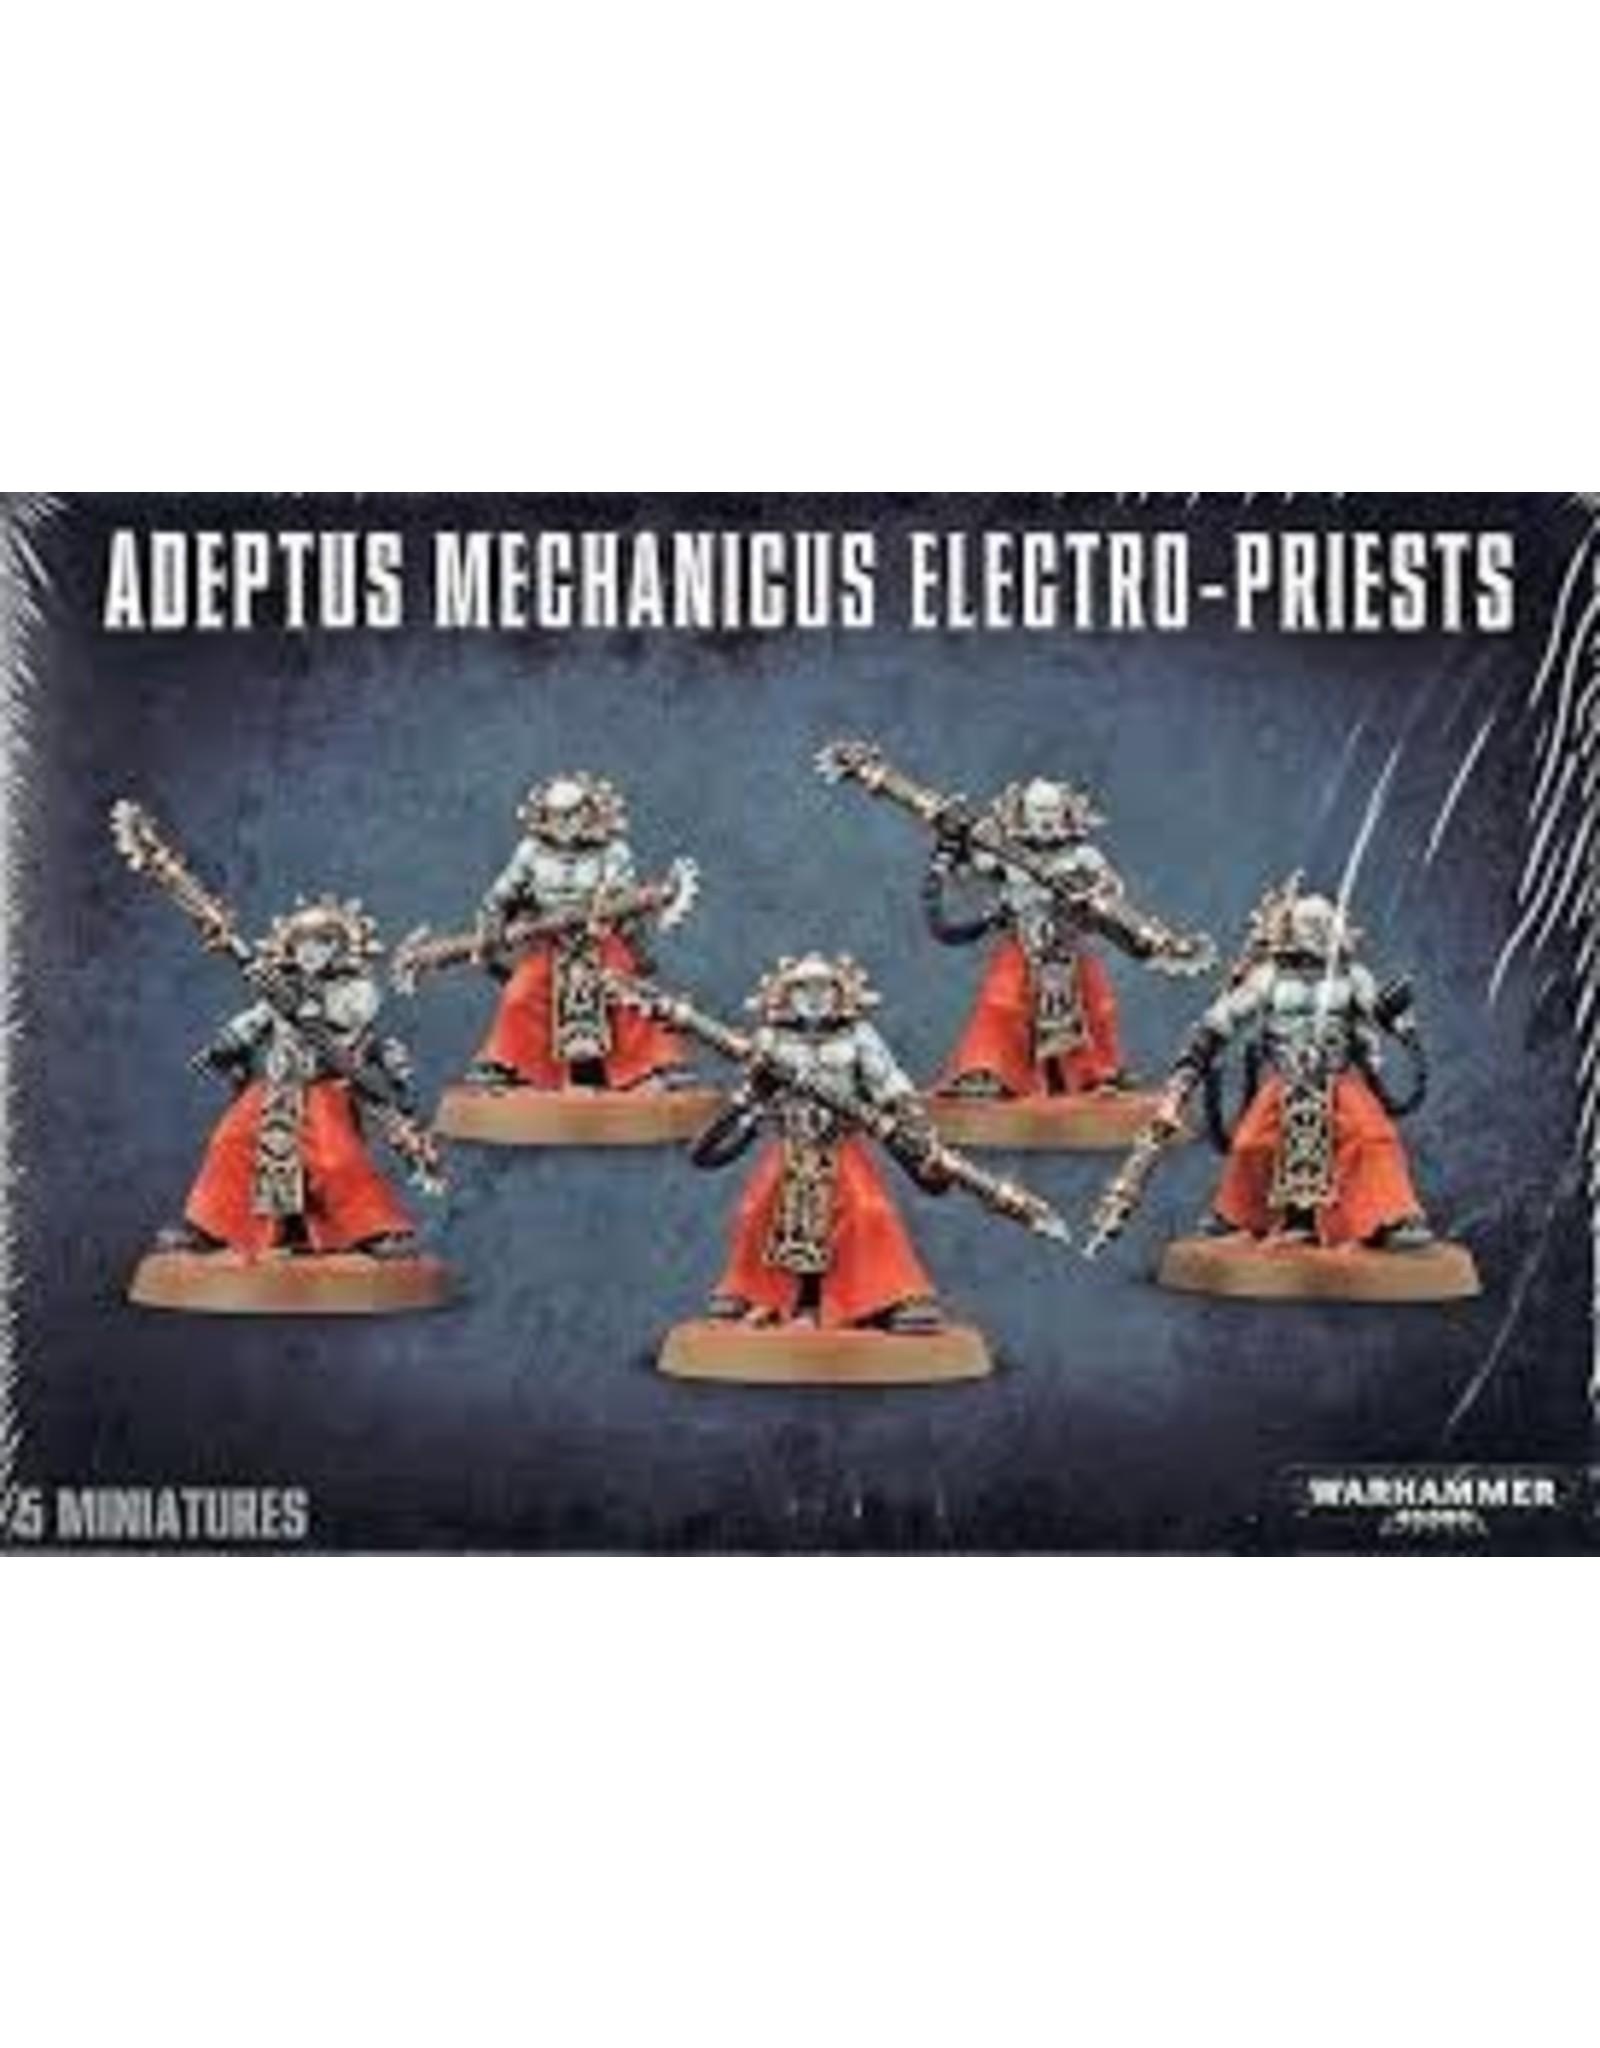 Warhammer 40K Adeptus Mechanicus Electro-Priests